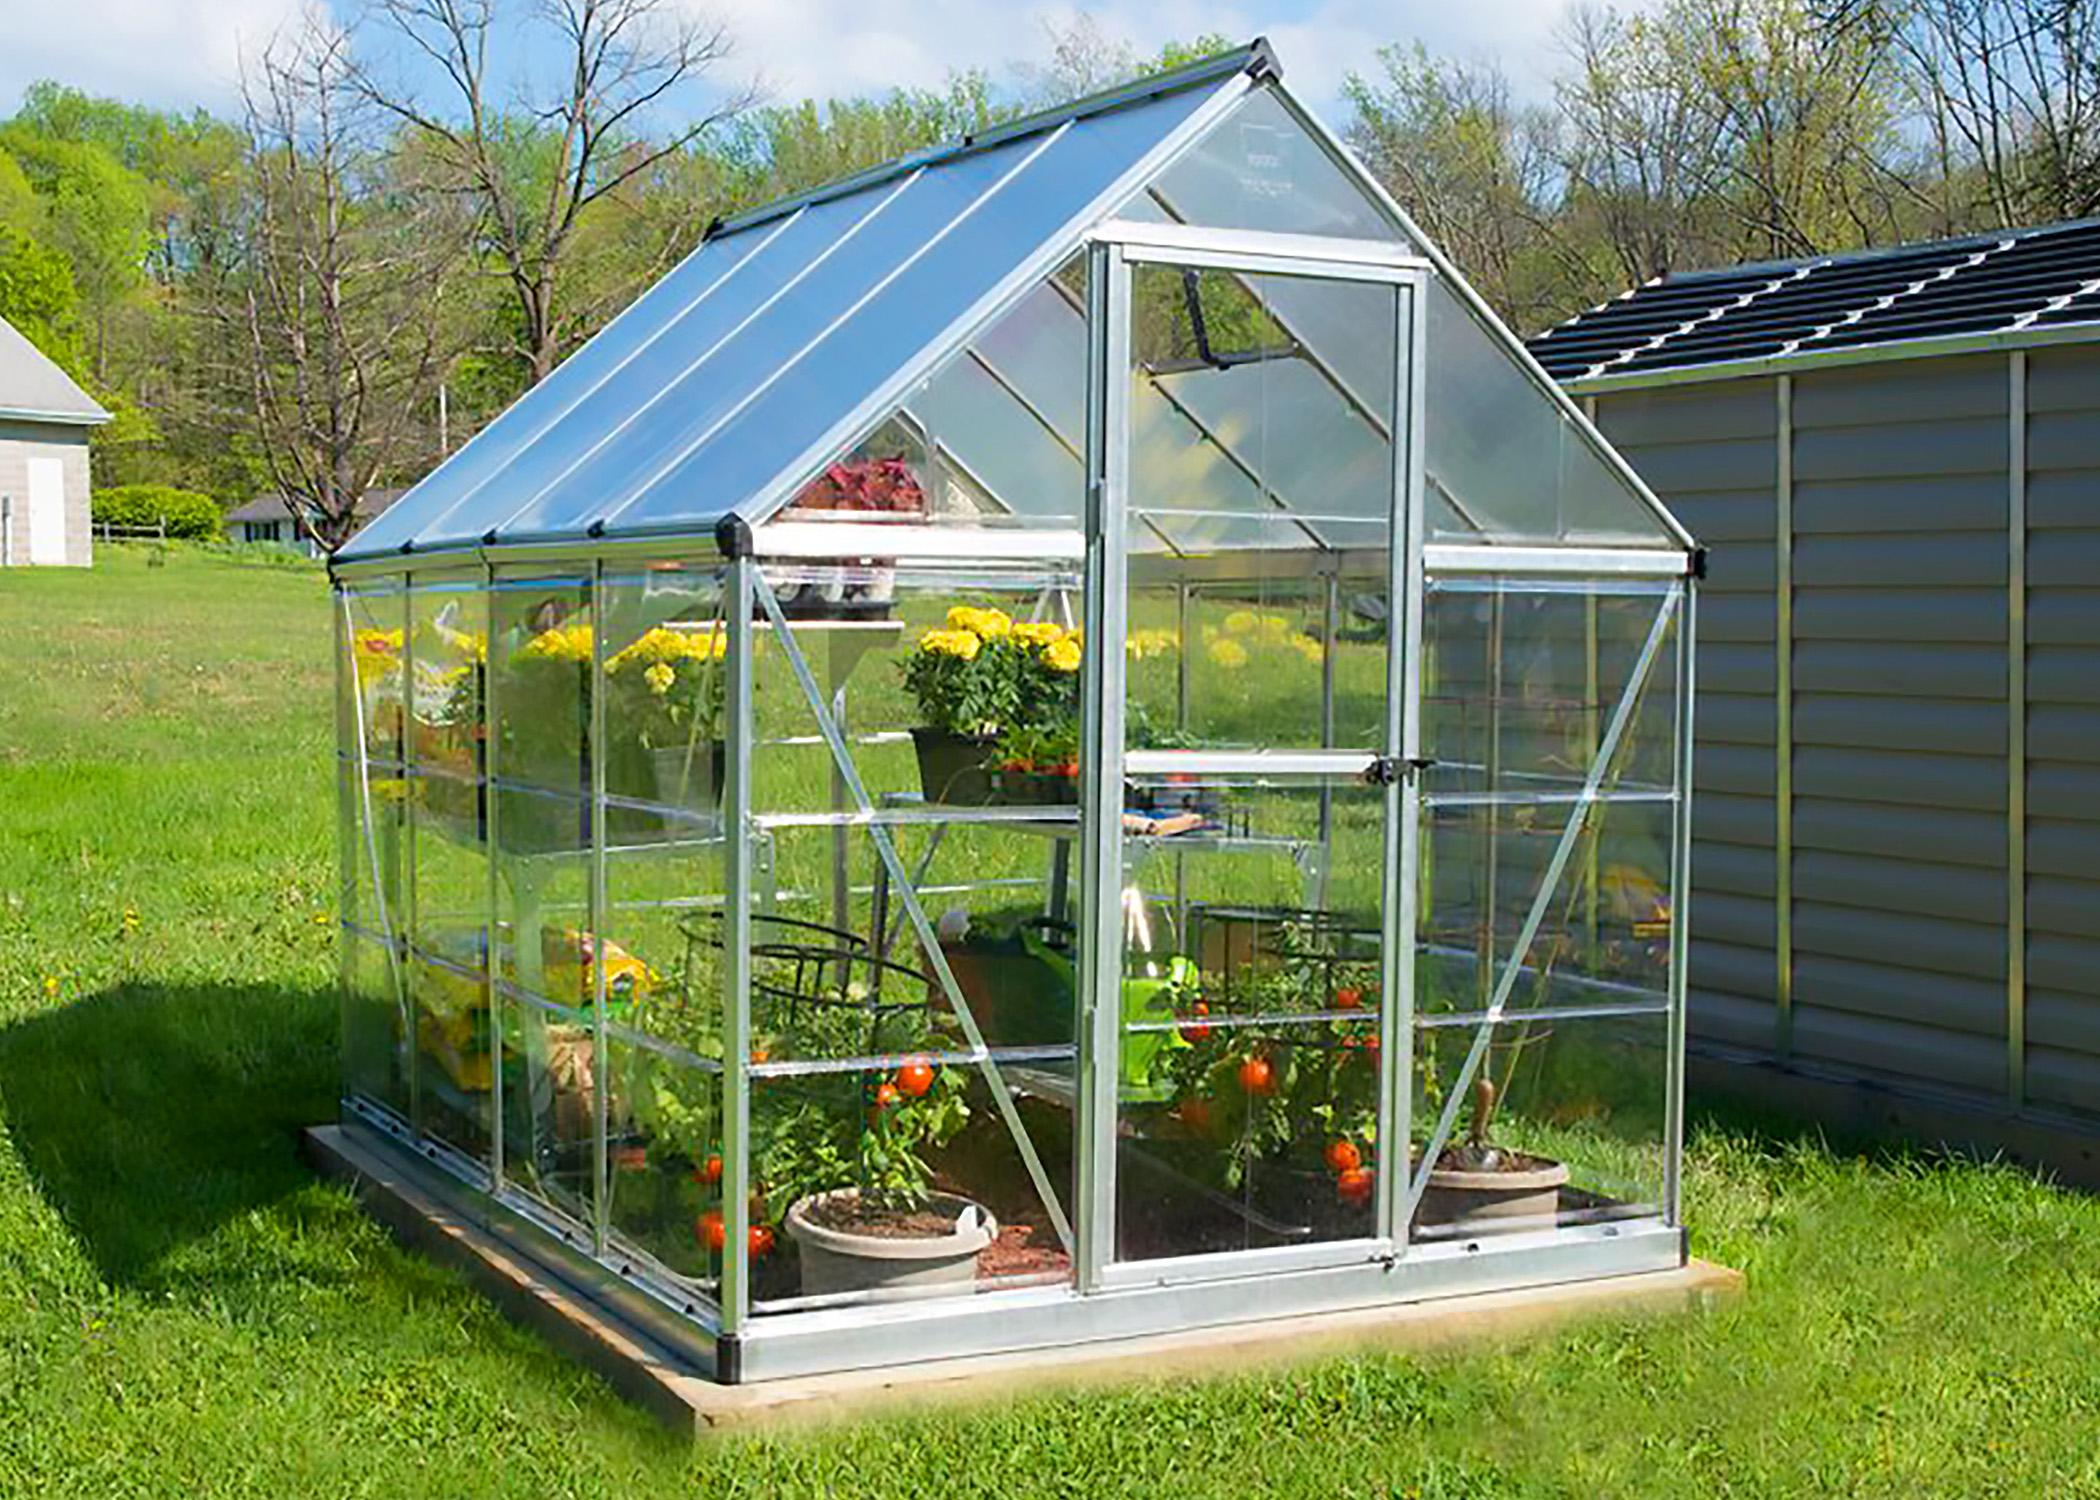 Zenport Walk-In Greenhouse SH7901 (L) 103 X (W) 78 X (H) 81 Inch Aluminum Frame